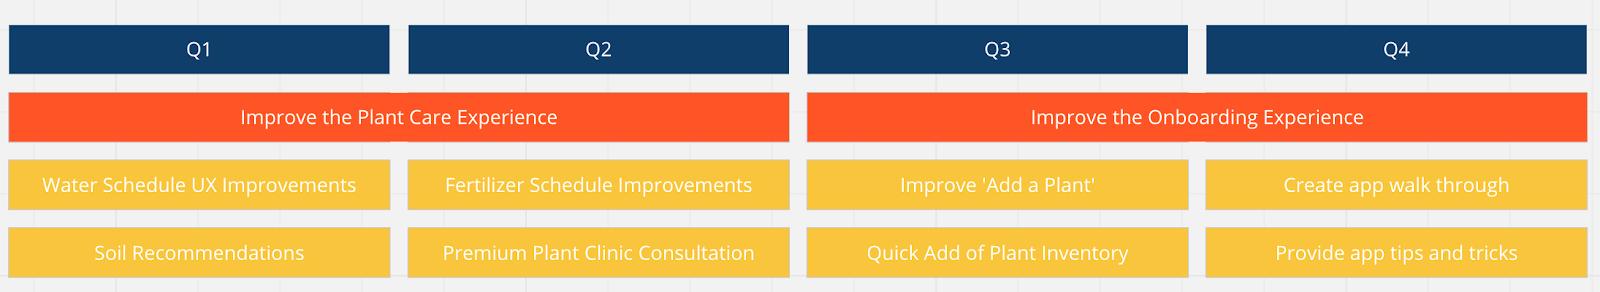 Oriented Roadmap Implementation Screenshot